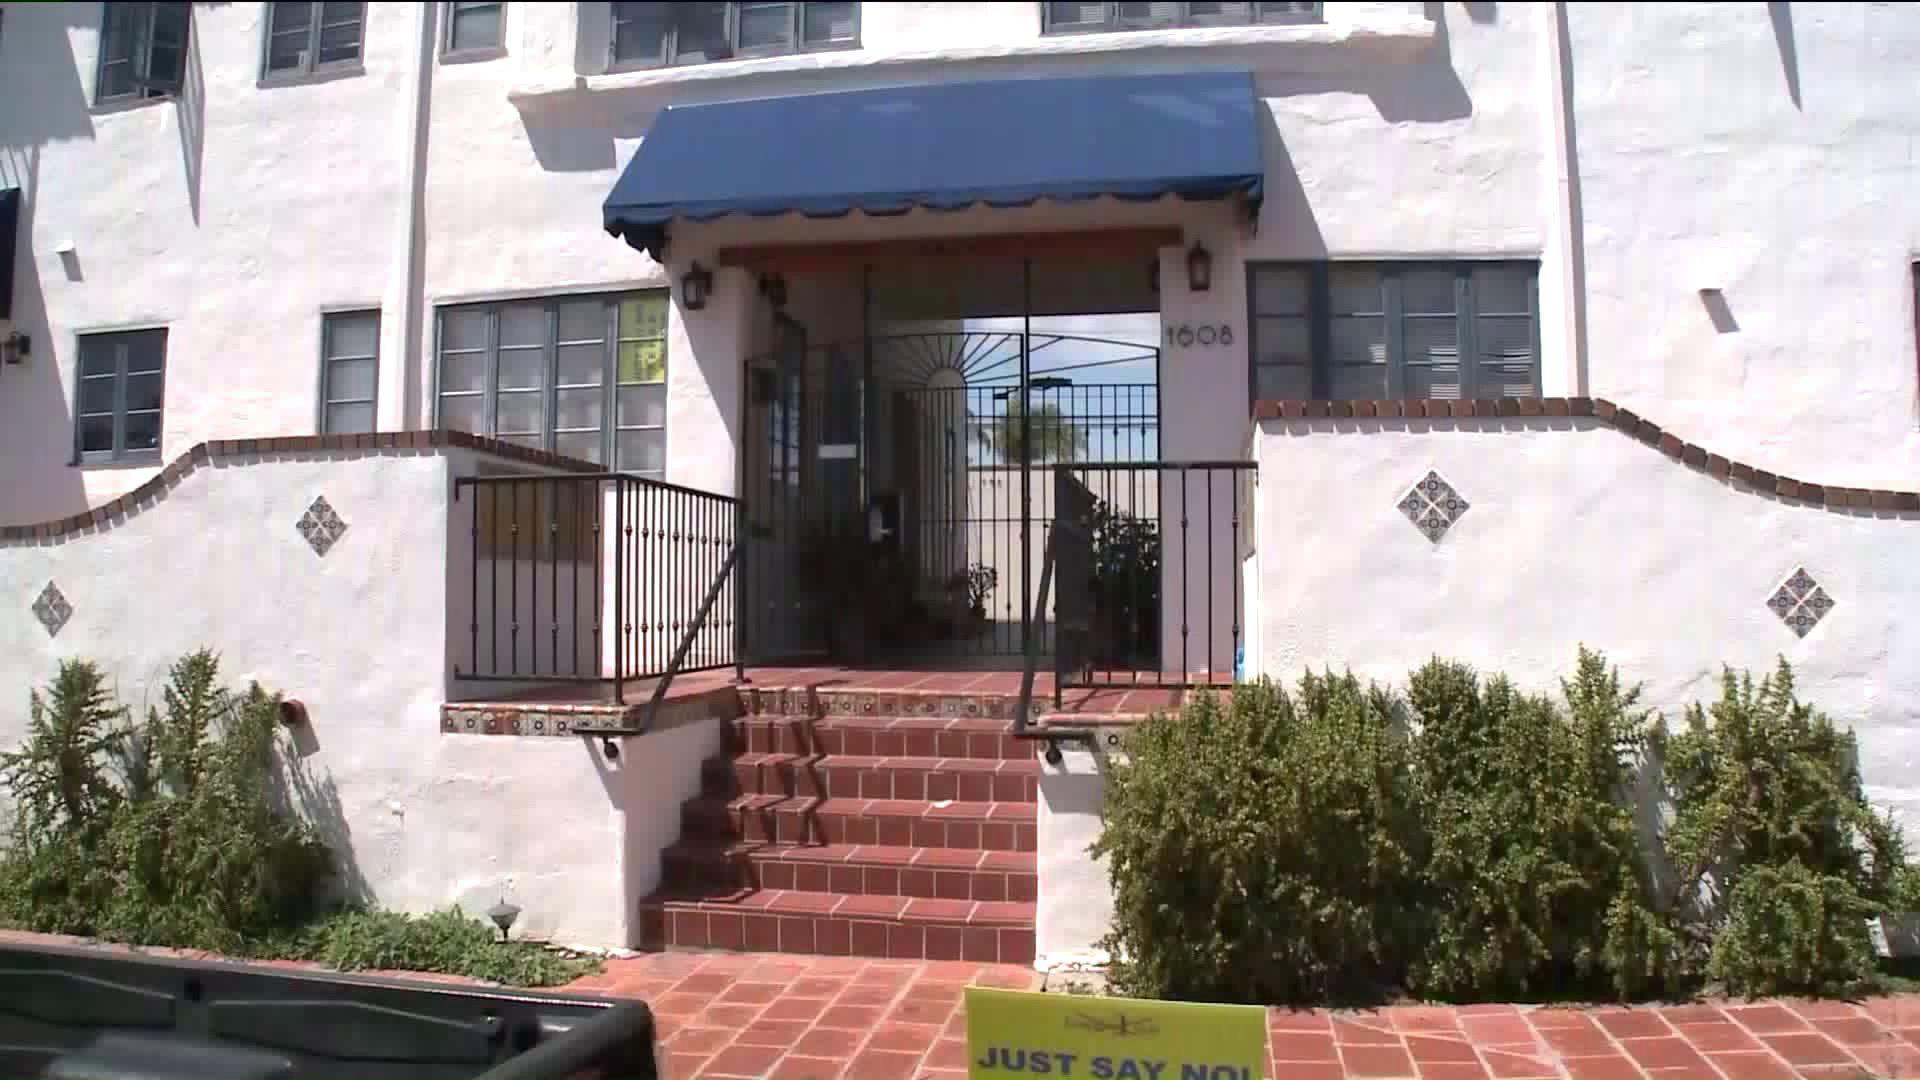 John and Ken - Homeless Attorneys Threaten to Sue to Block San Clemente Plan